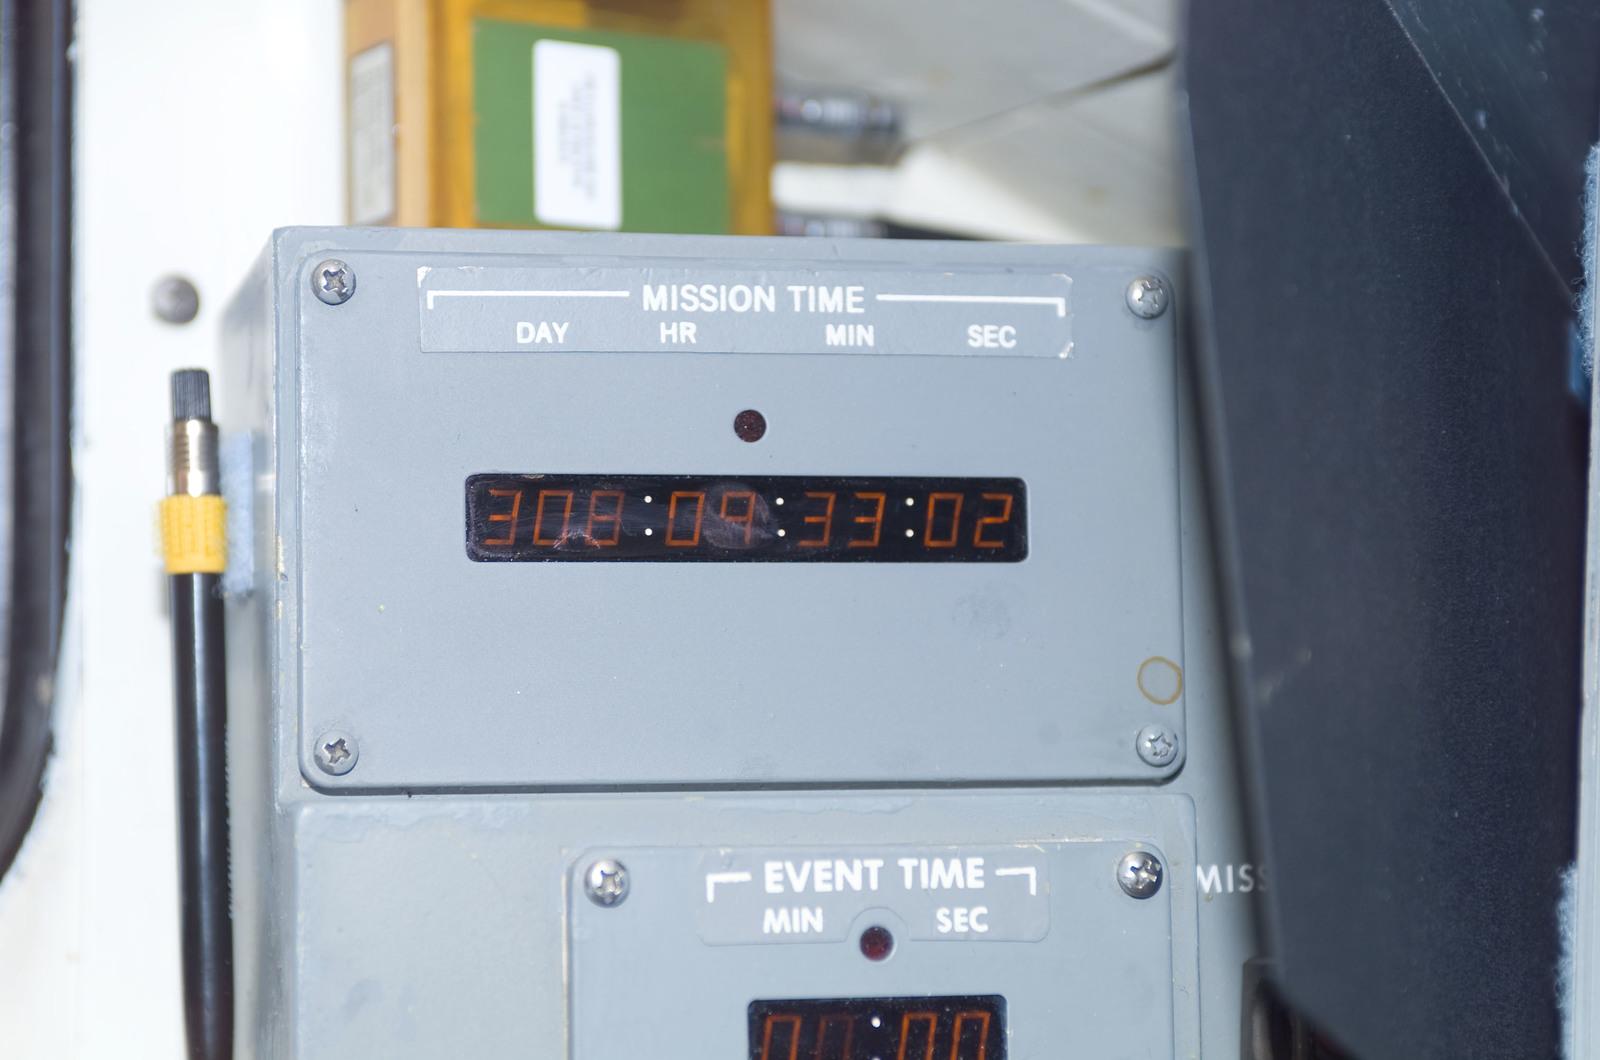 S120E008327 - STS-120 - Clock on flight deck